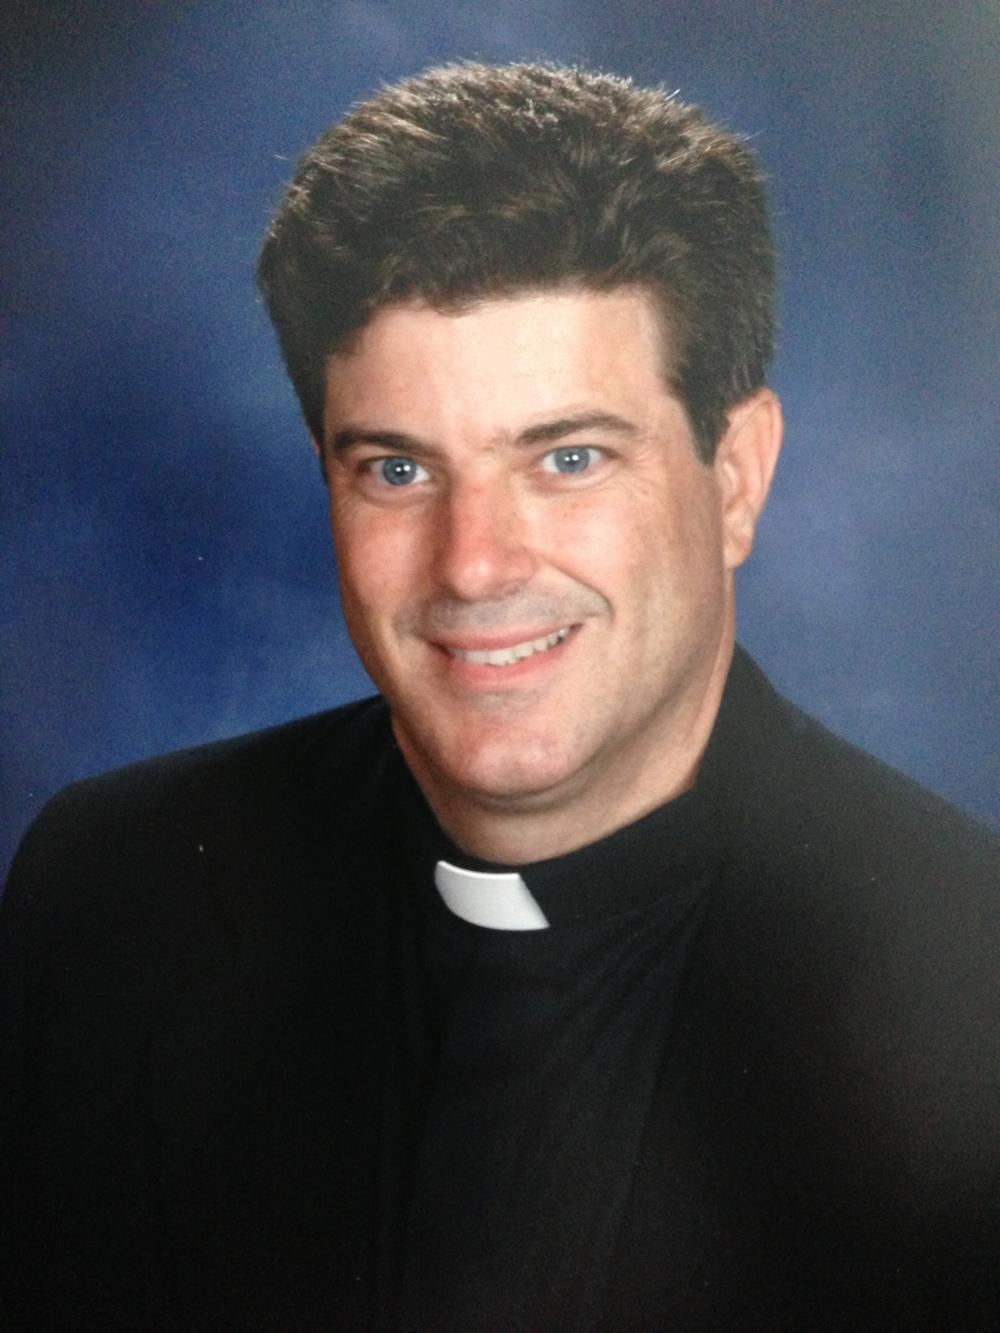 Priest_1500x1500_021.png